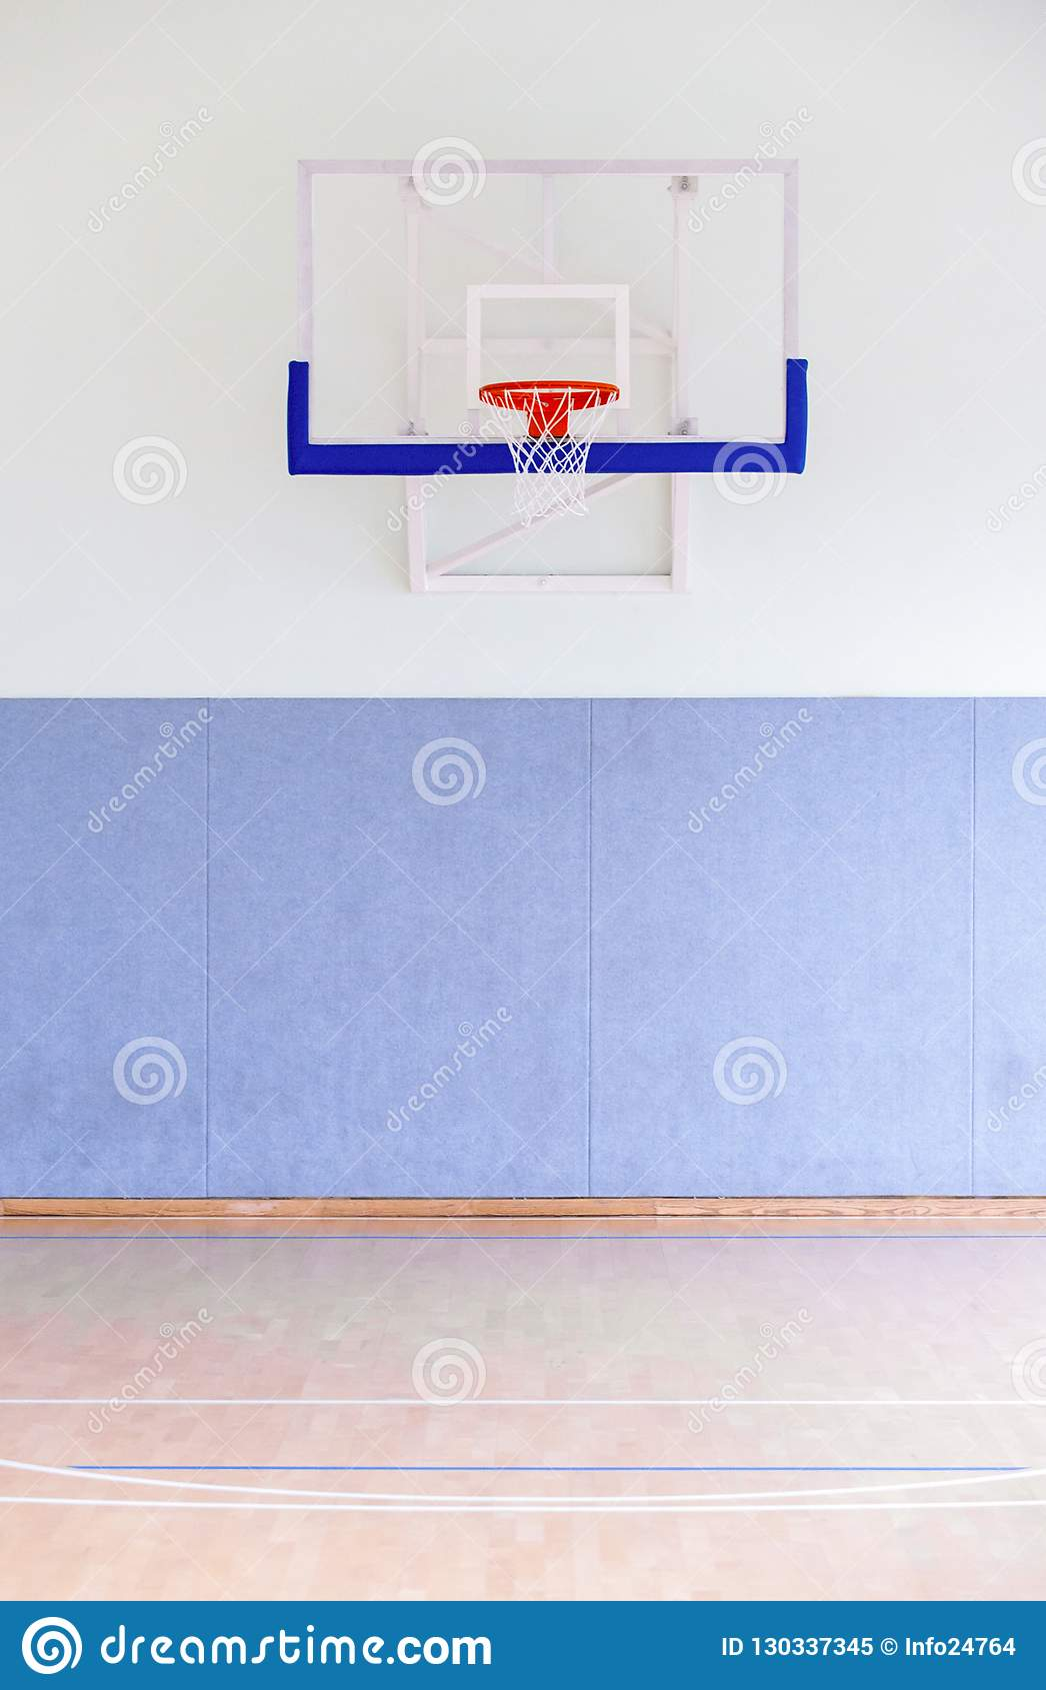 Basketballkorbkäfig, lokalisierte große Rückenbrettnahaufnahme, neues outd